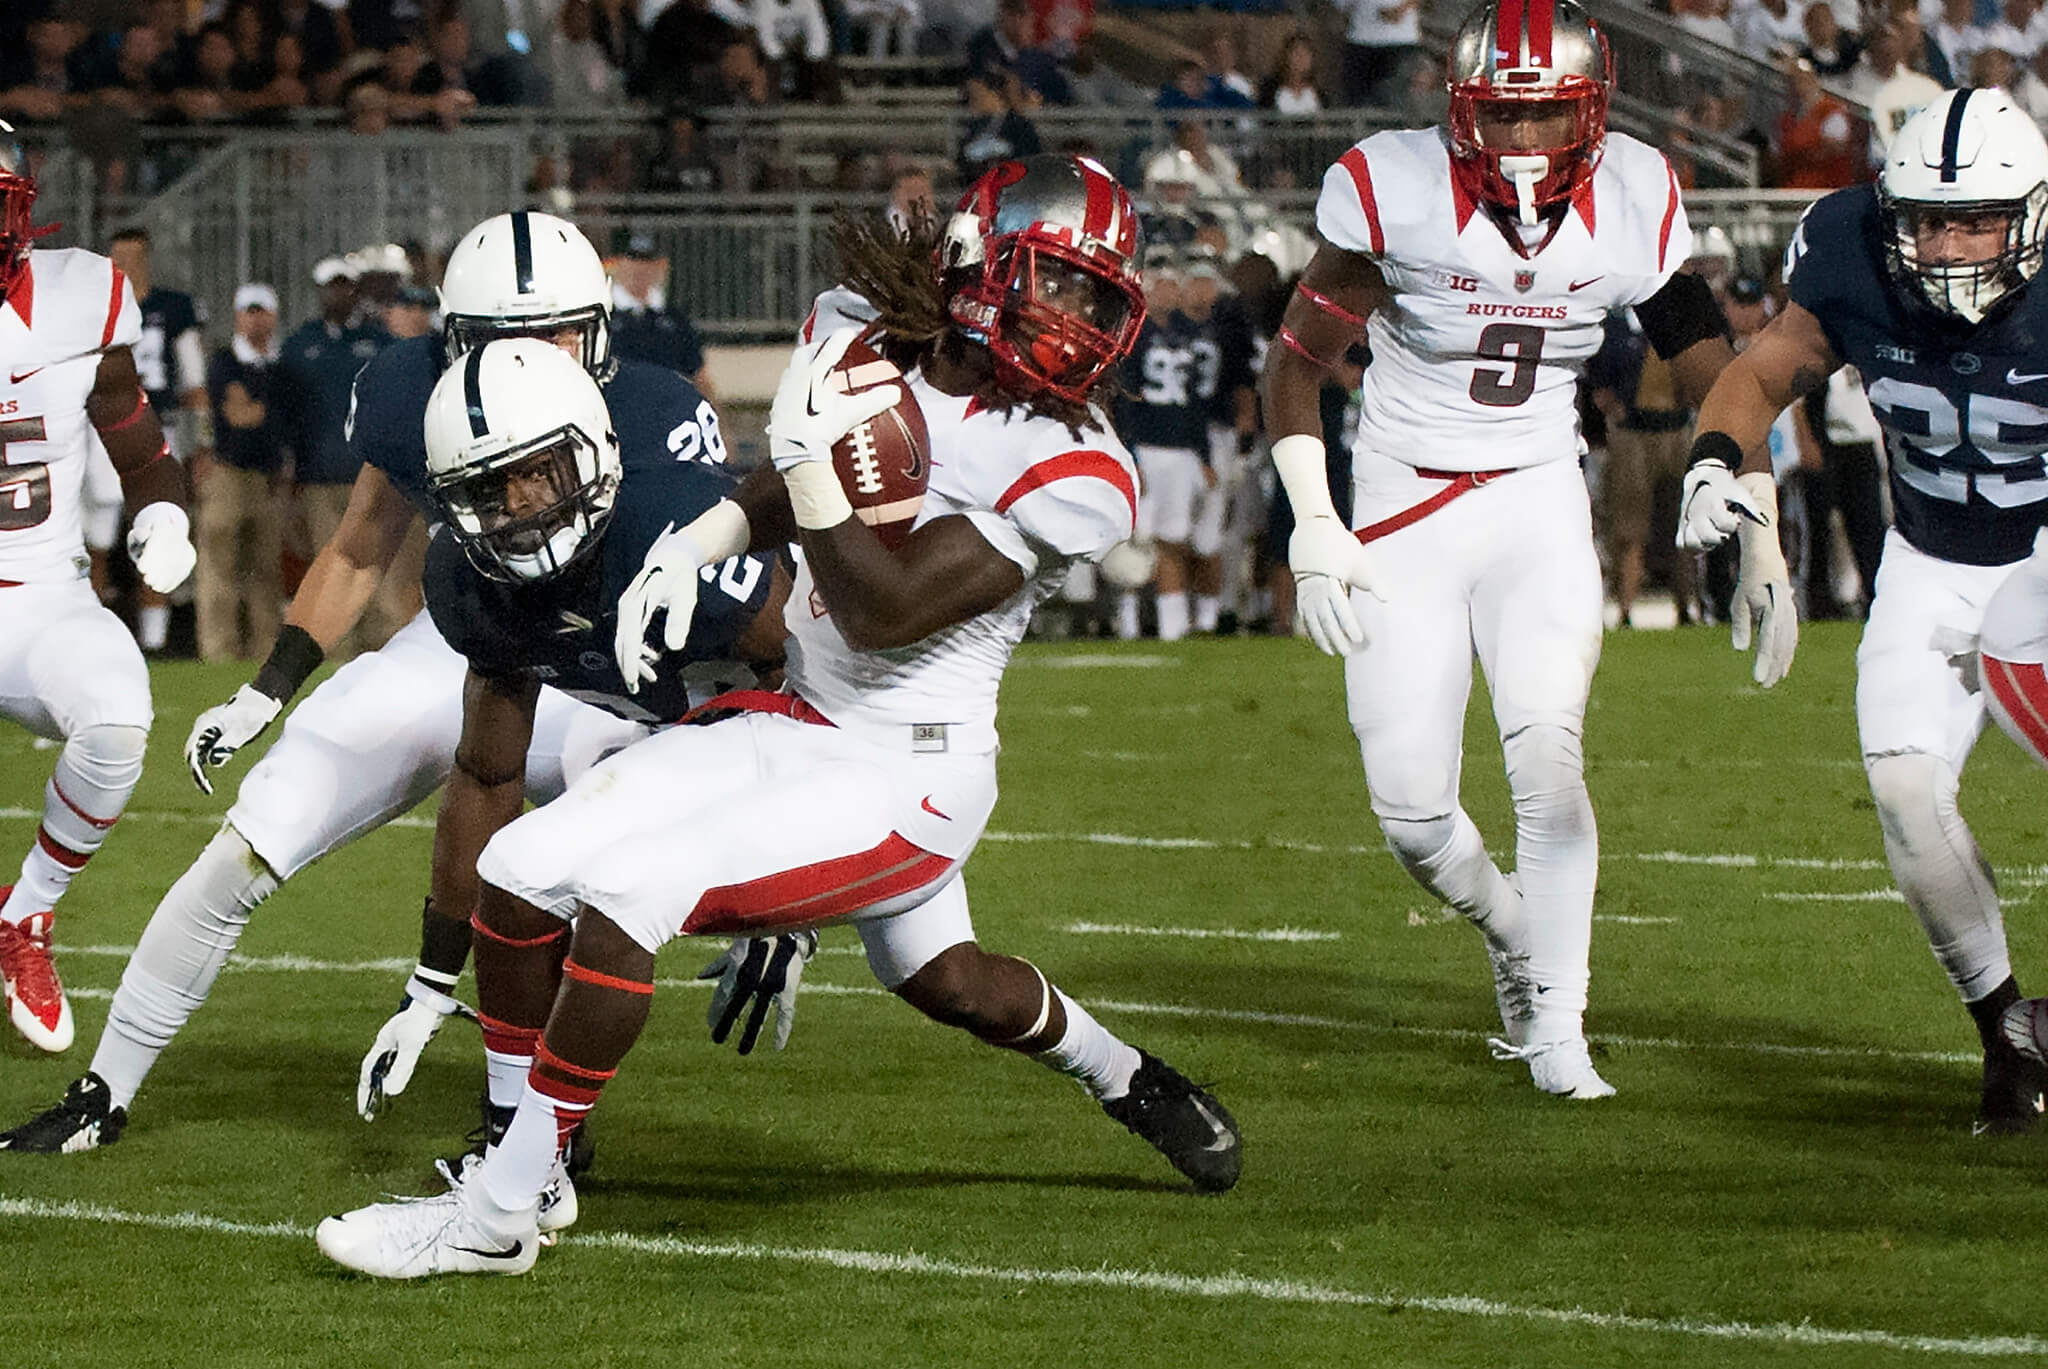 Rutgers vs Penn State rivalry